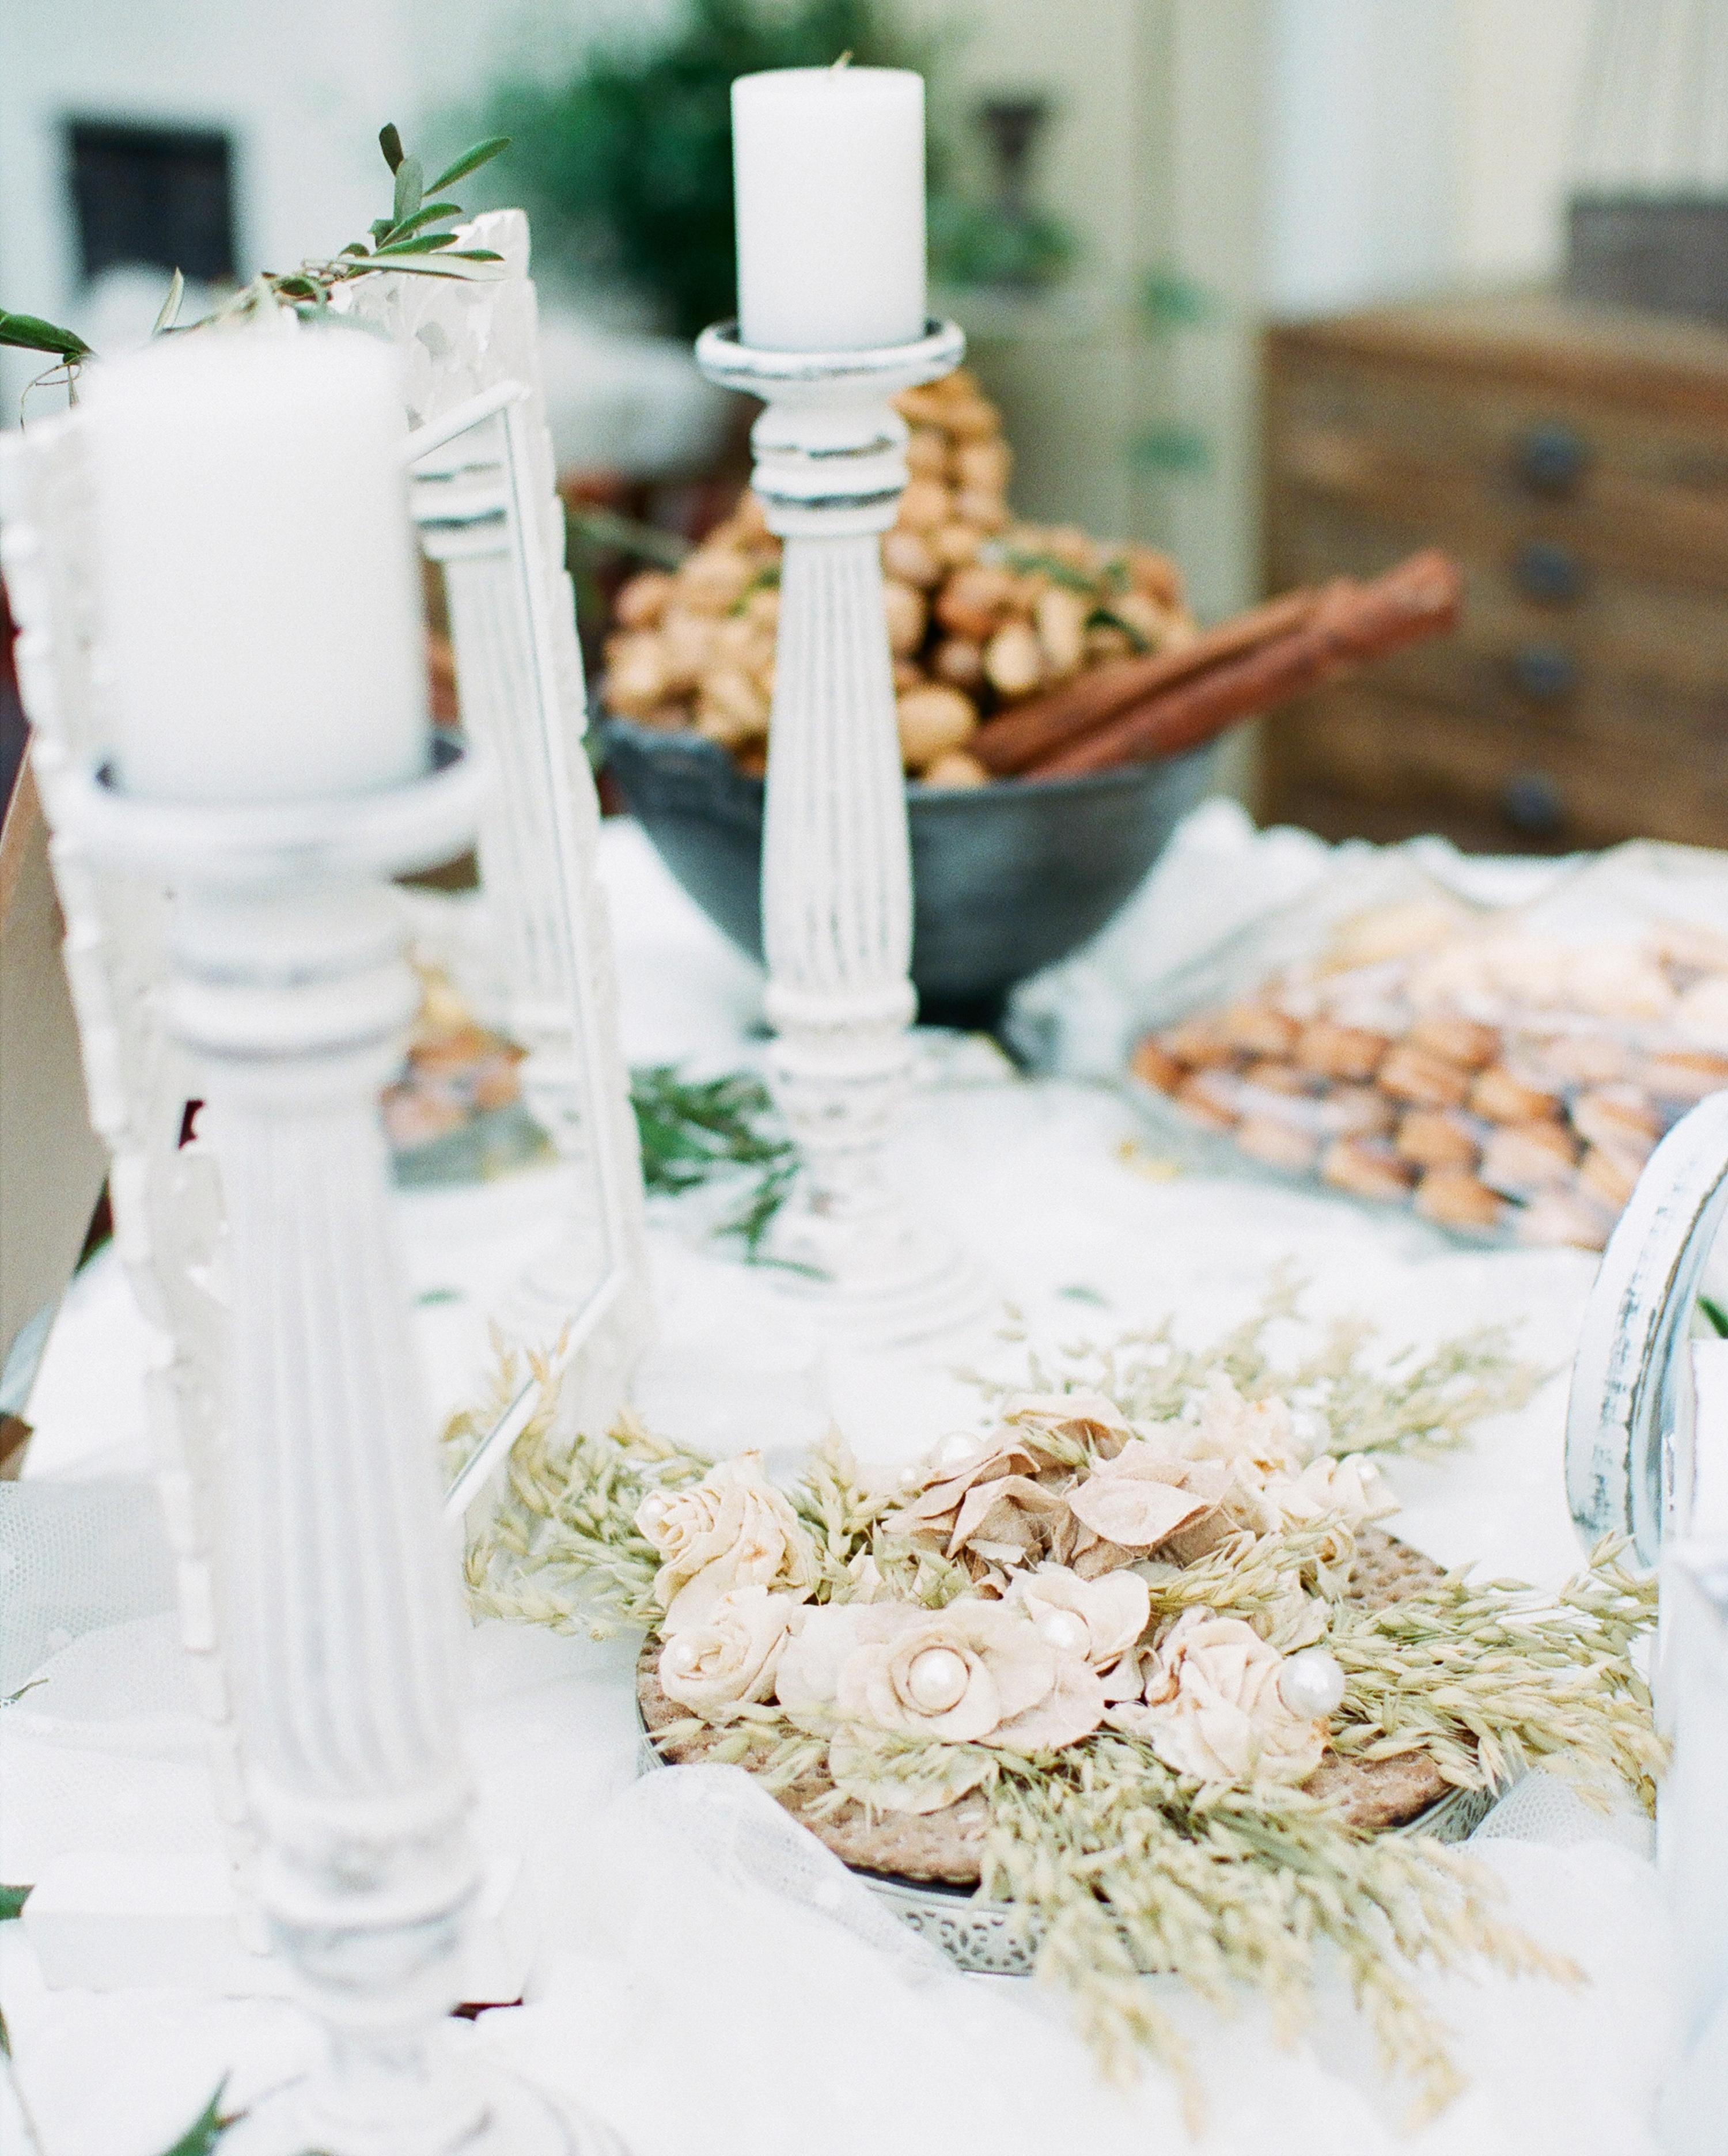 negin-chris-wedding-food-0364-s112116-0815.jpg